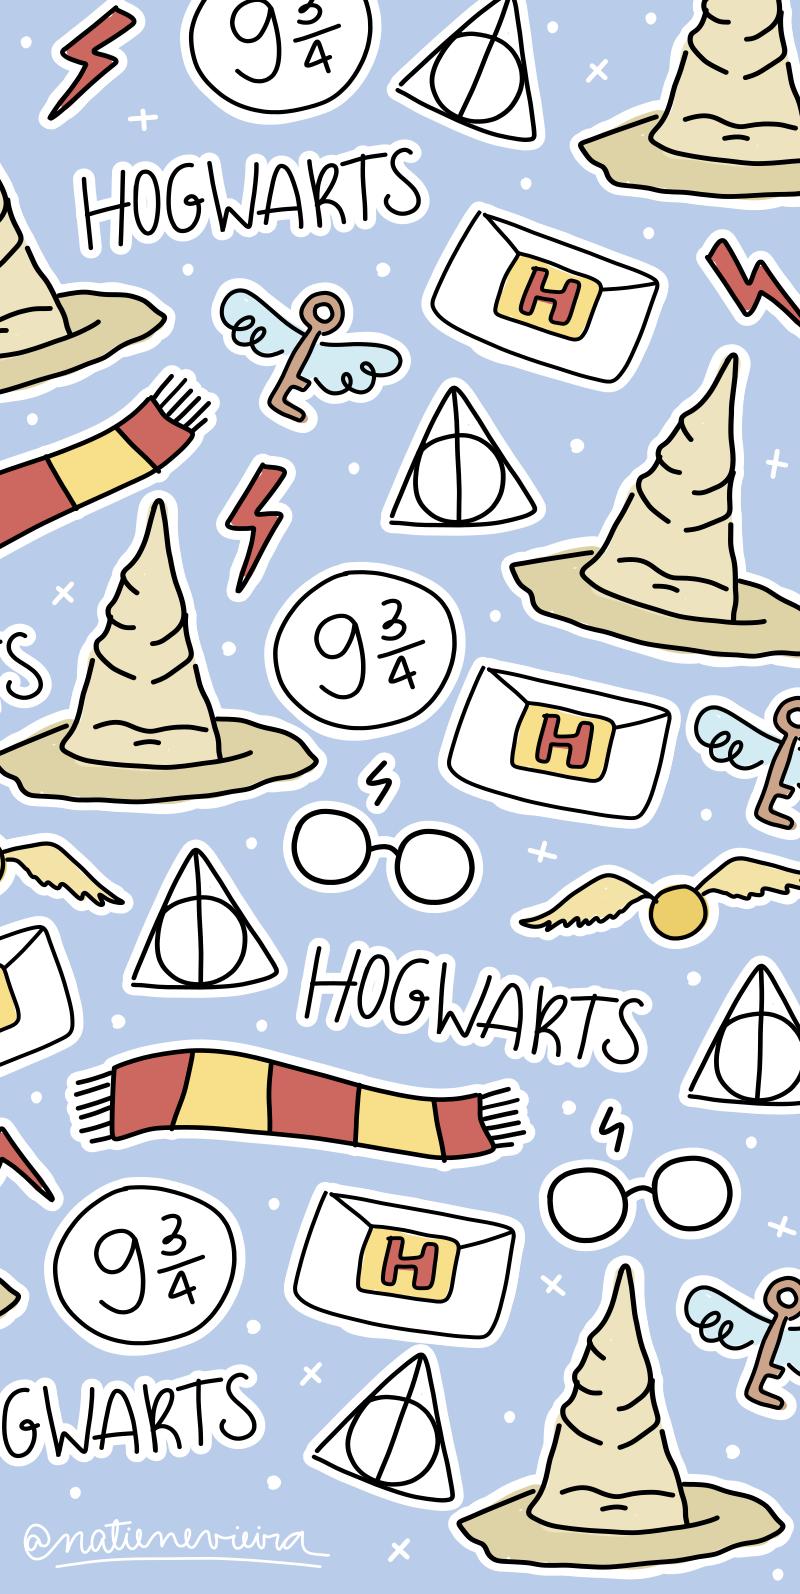 Pin By Amy Oliva On Like Harry Potter Illustrations Harry Potter Wallpaper Harry Potter Wallpaper Backgrounds